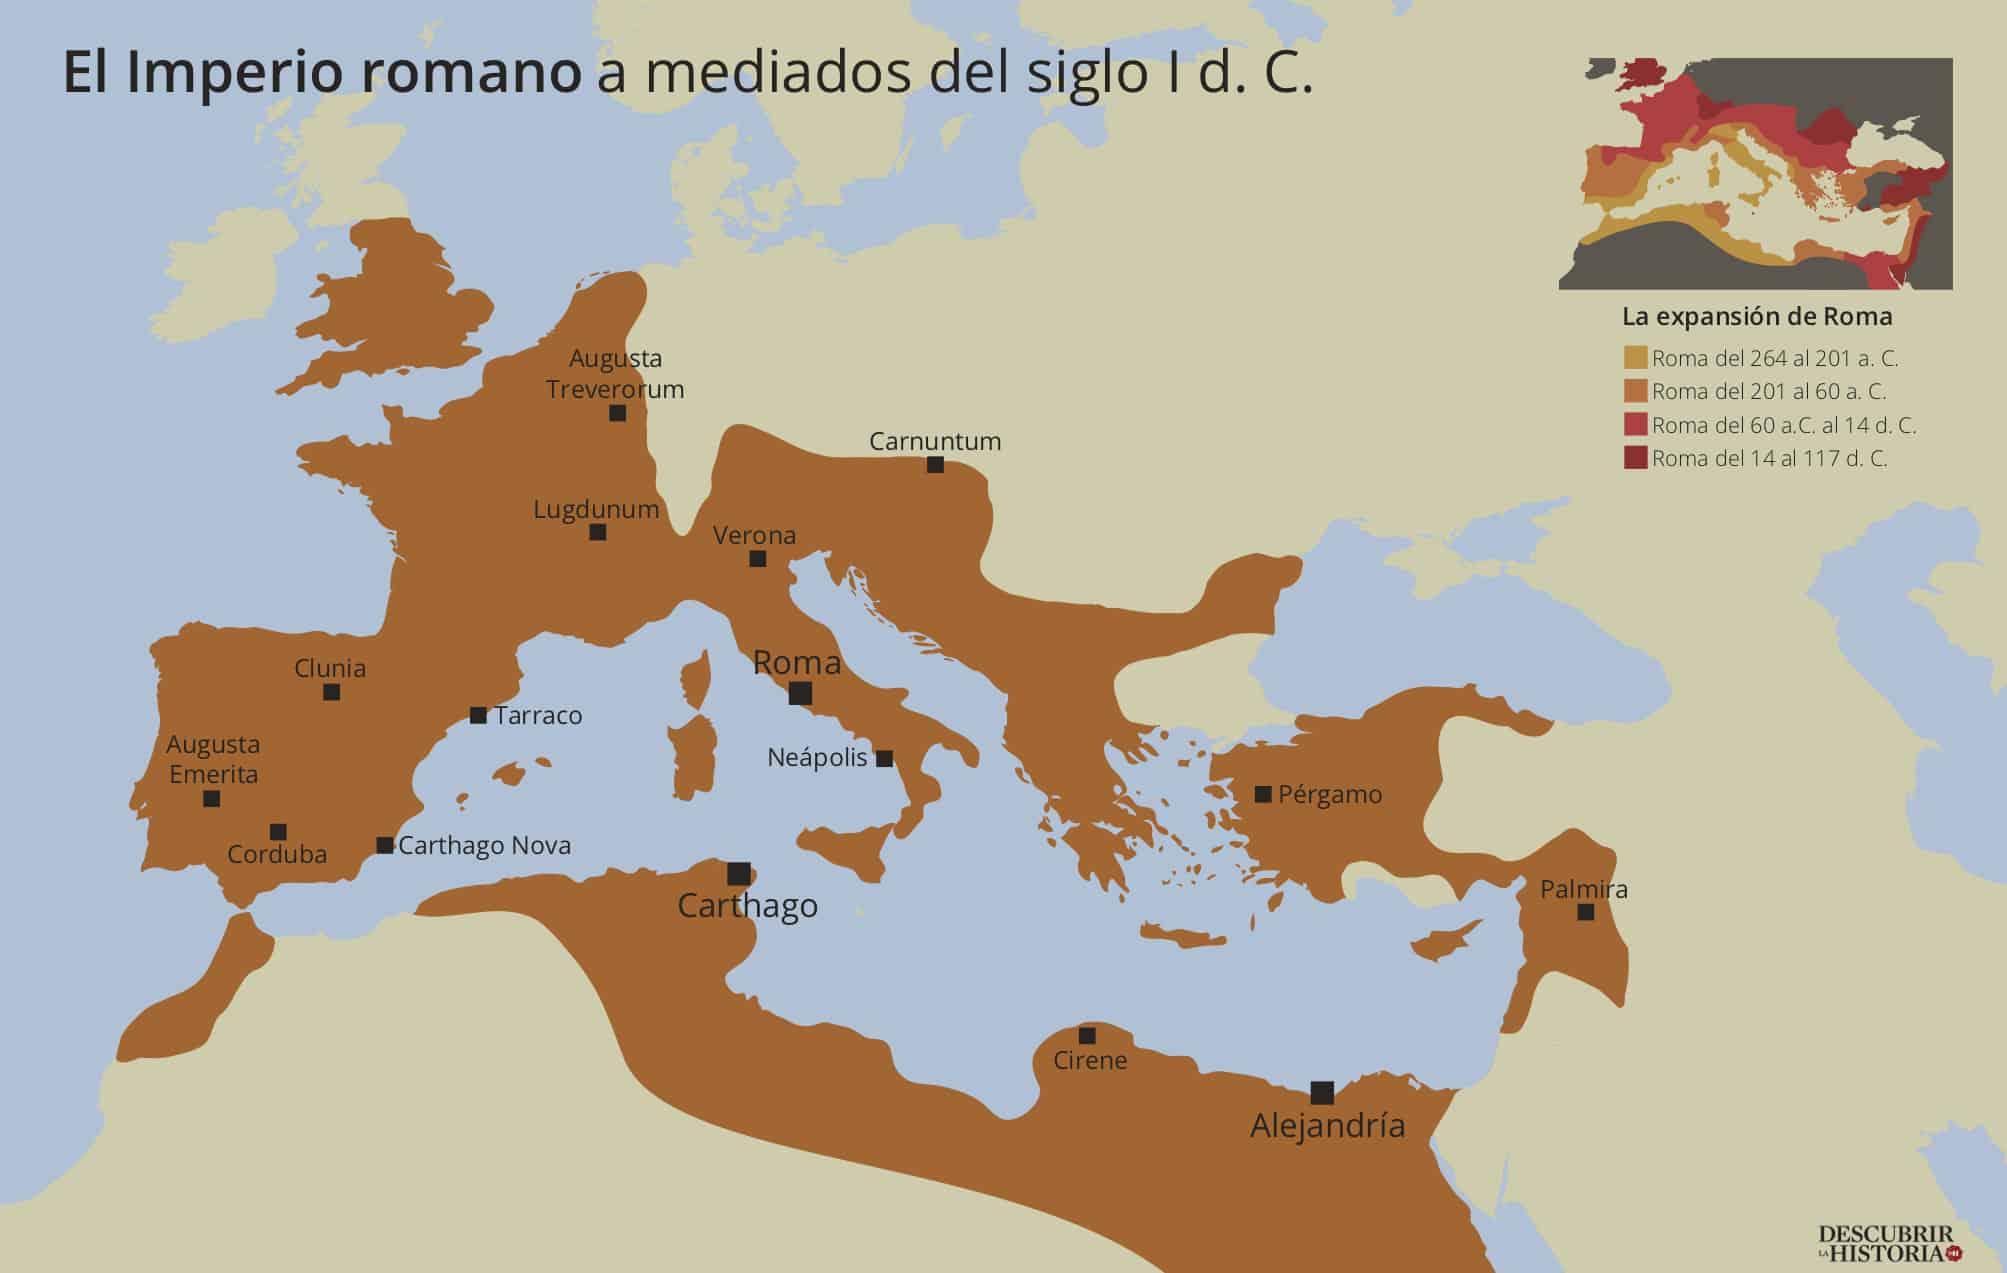 El Imperio romano a mediados del siglo I d. C. (Mapa de Juan Pérez Ventura).